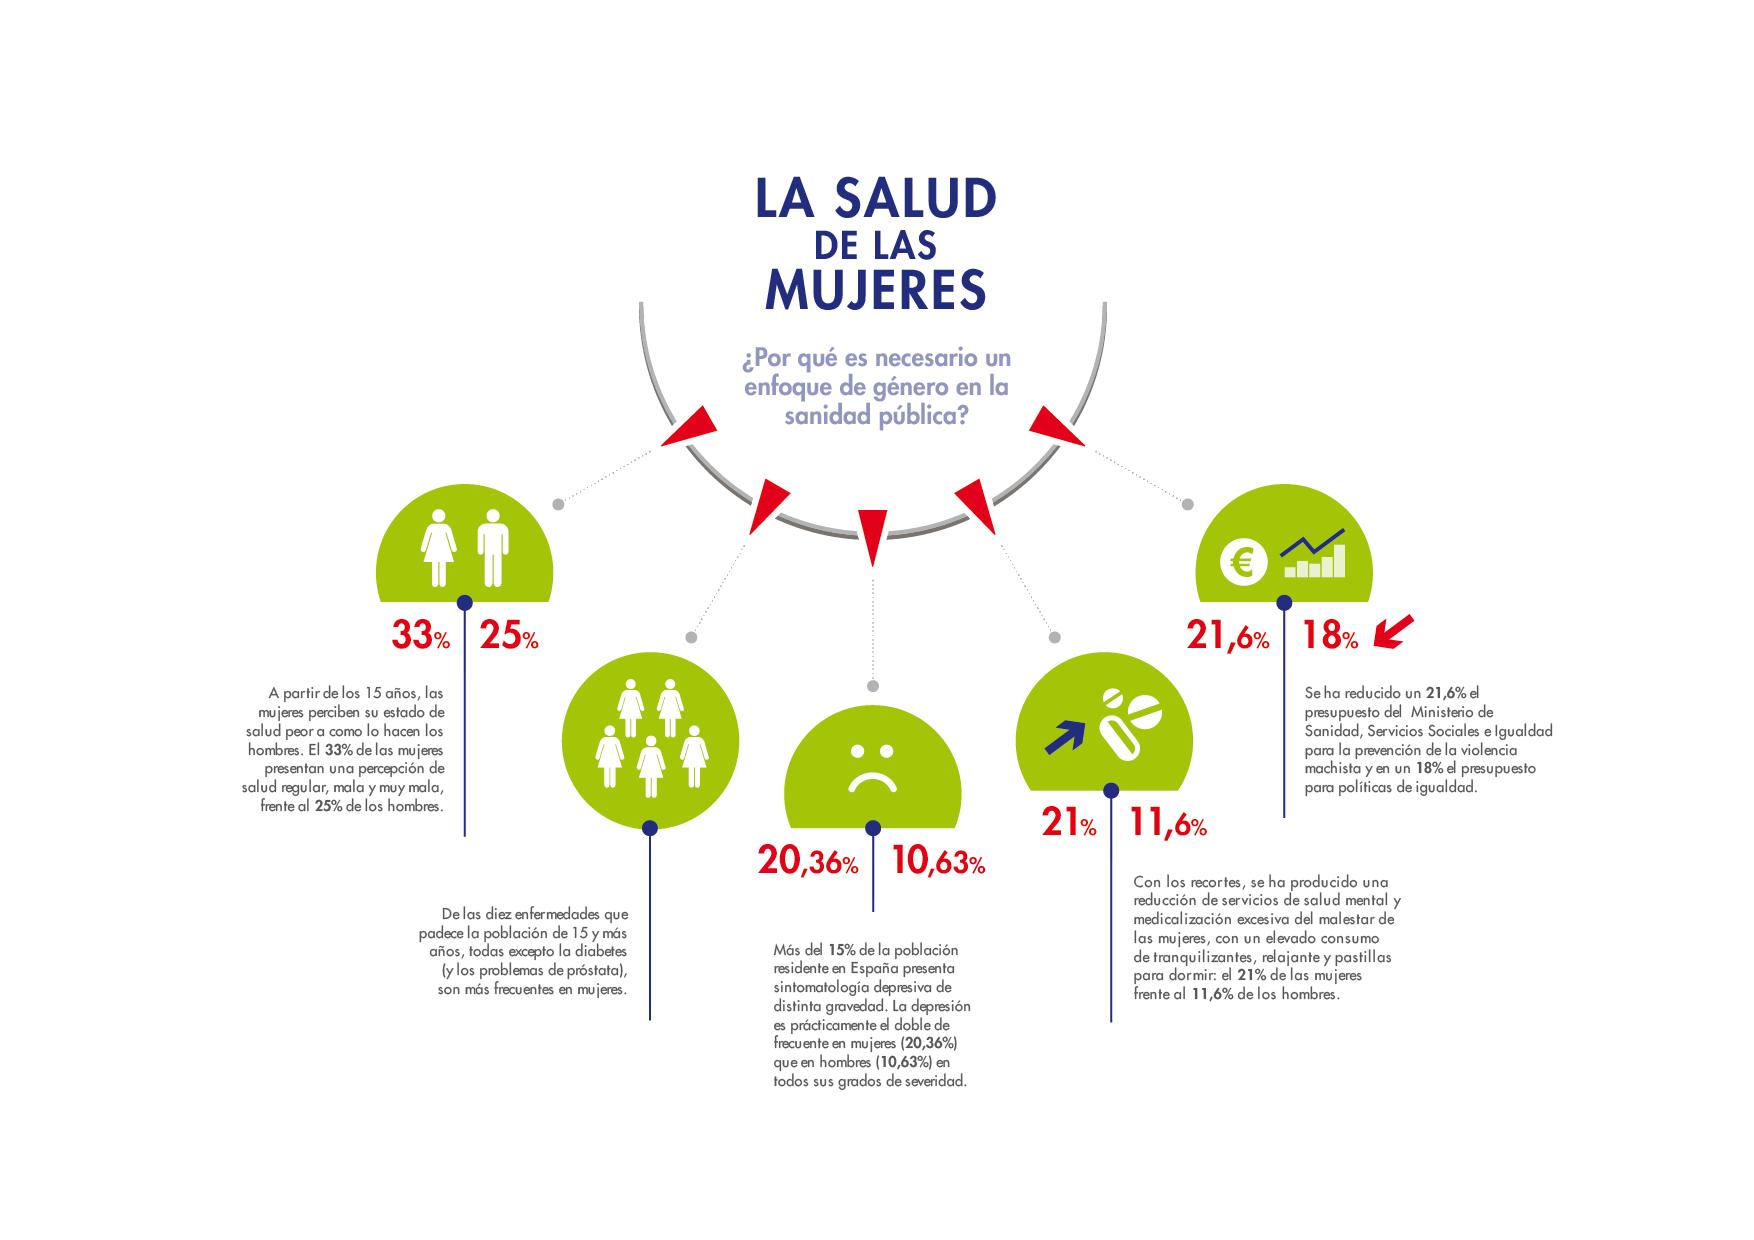 Mdm Infografia Datos Y Cifras 1 - MdM España